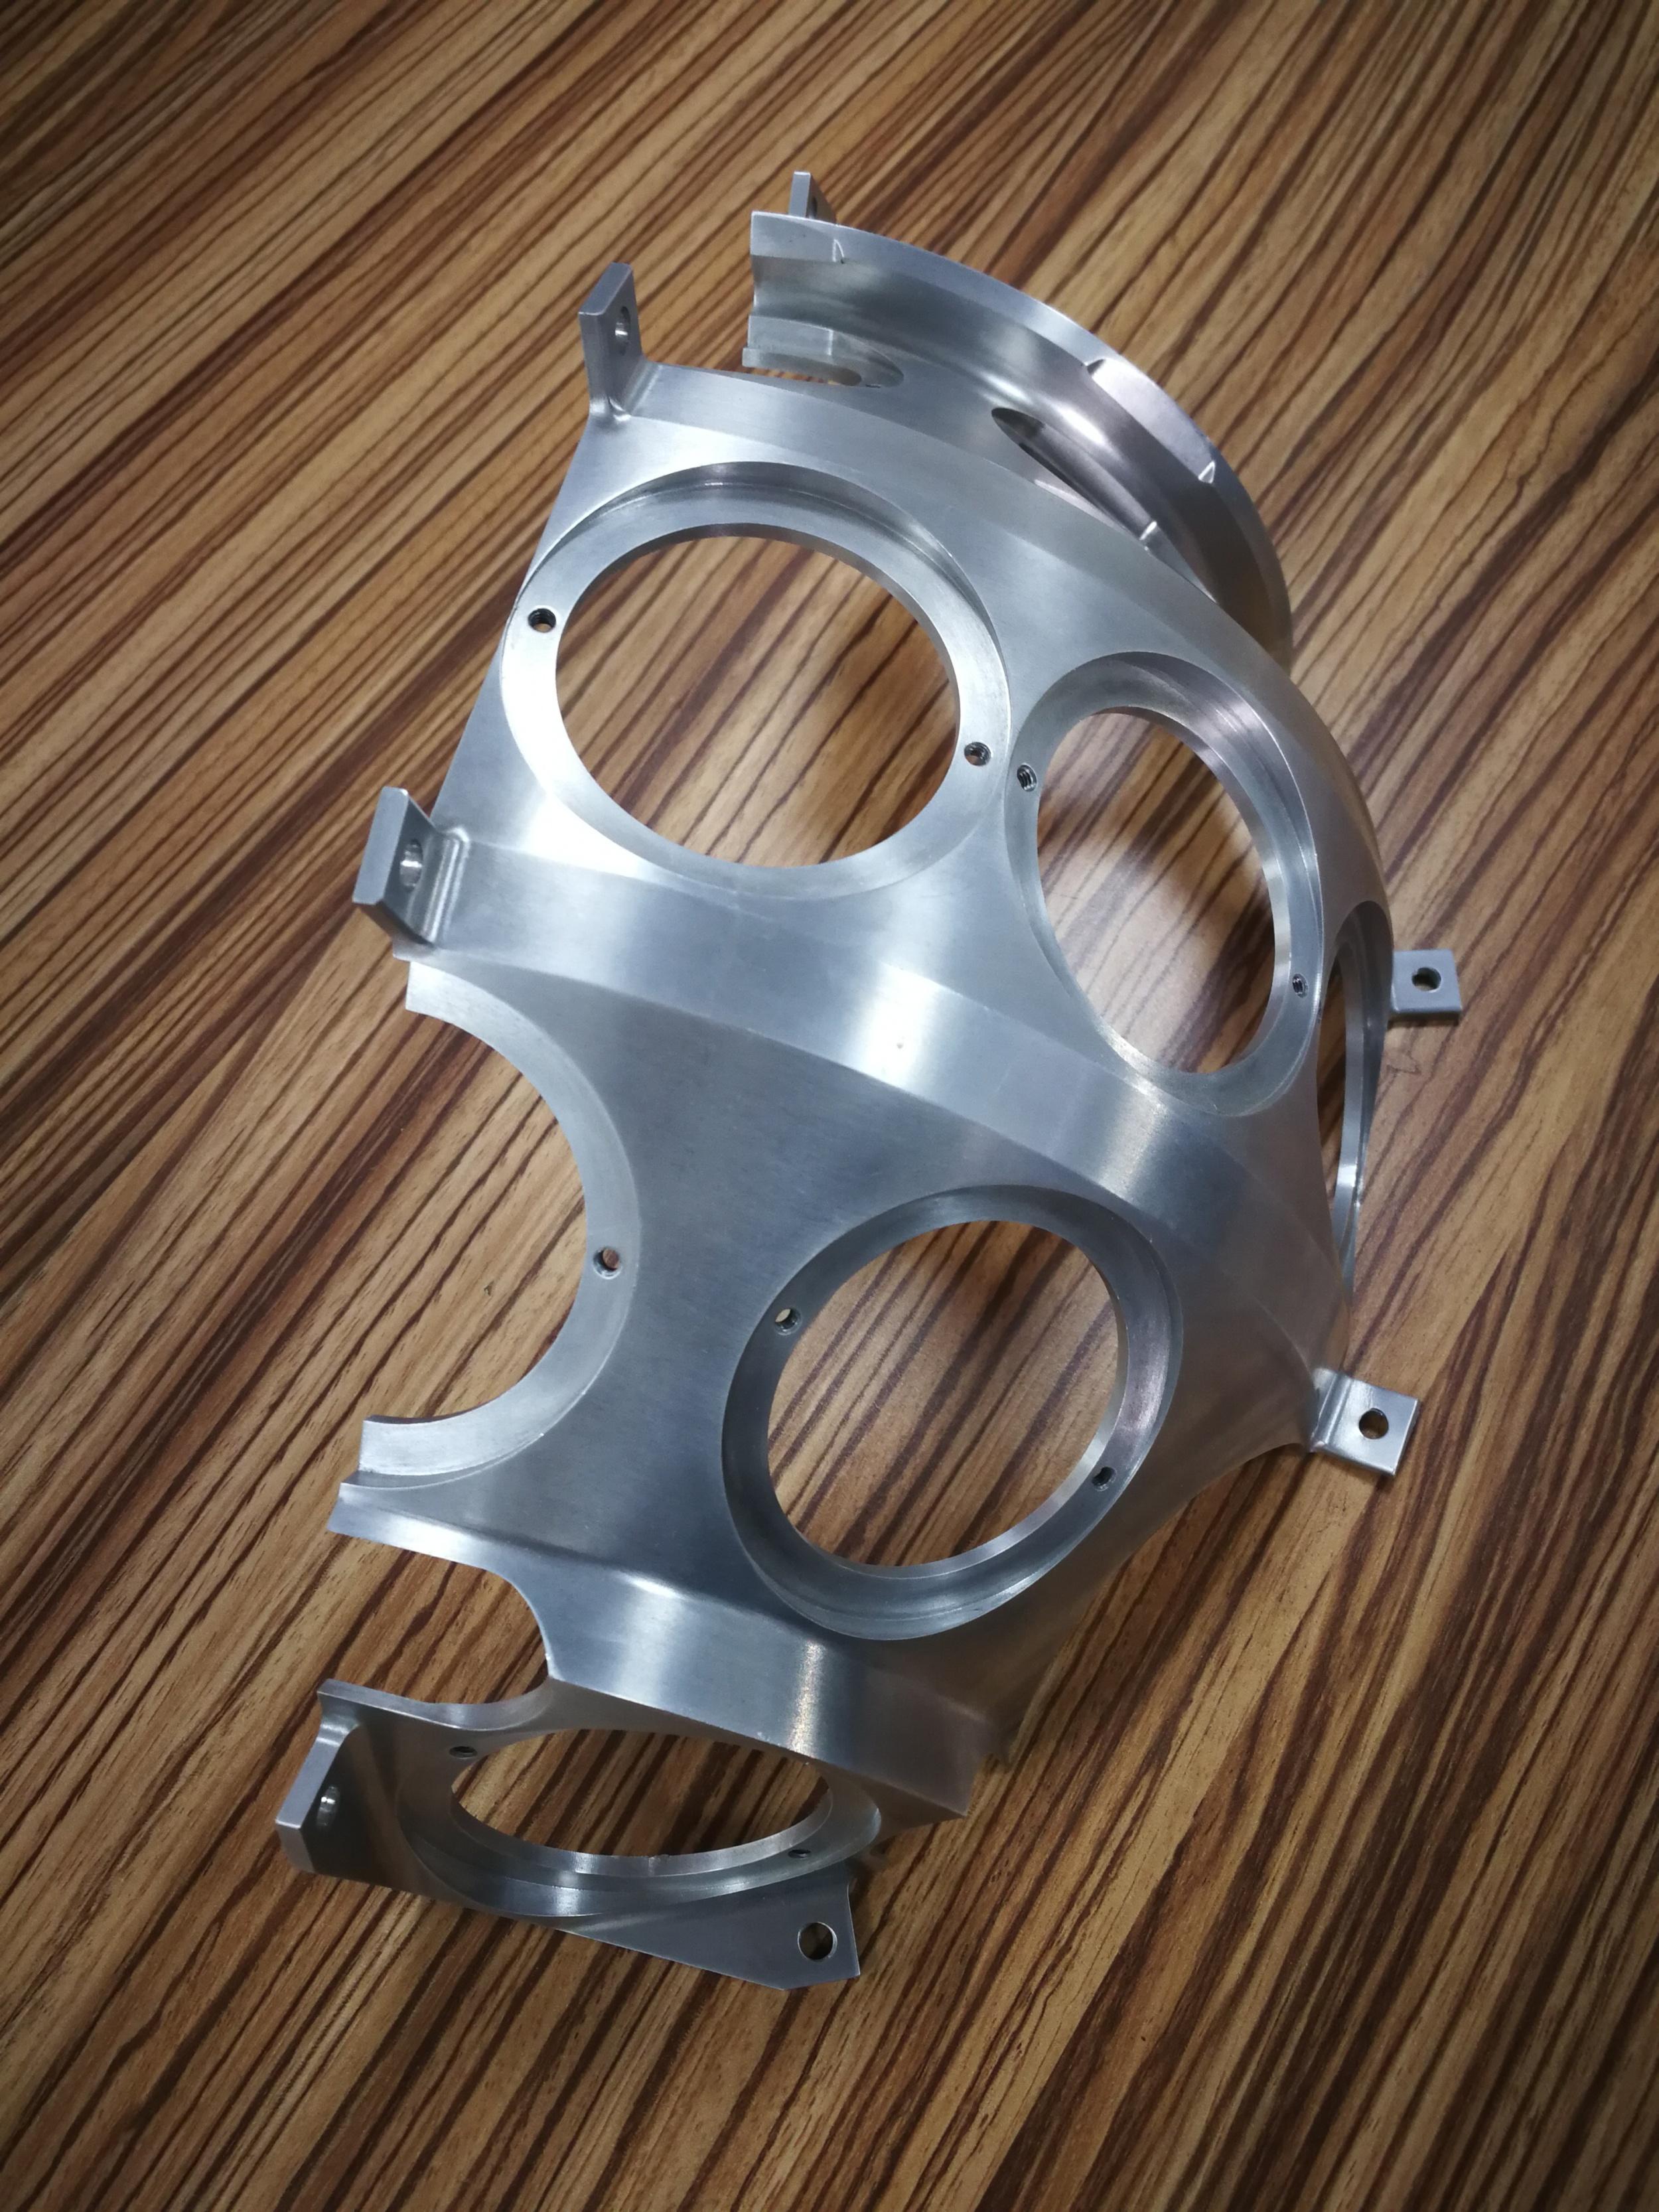 5 Axies Product